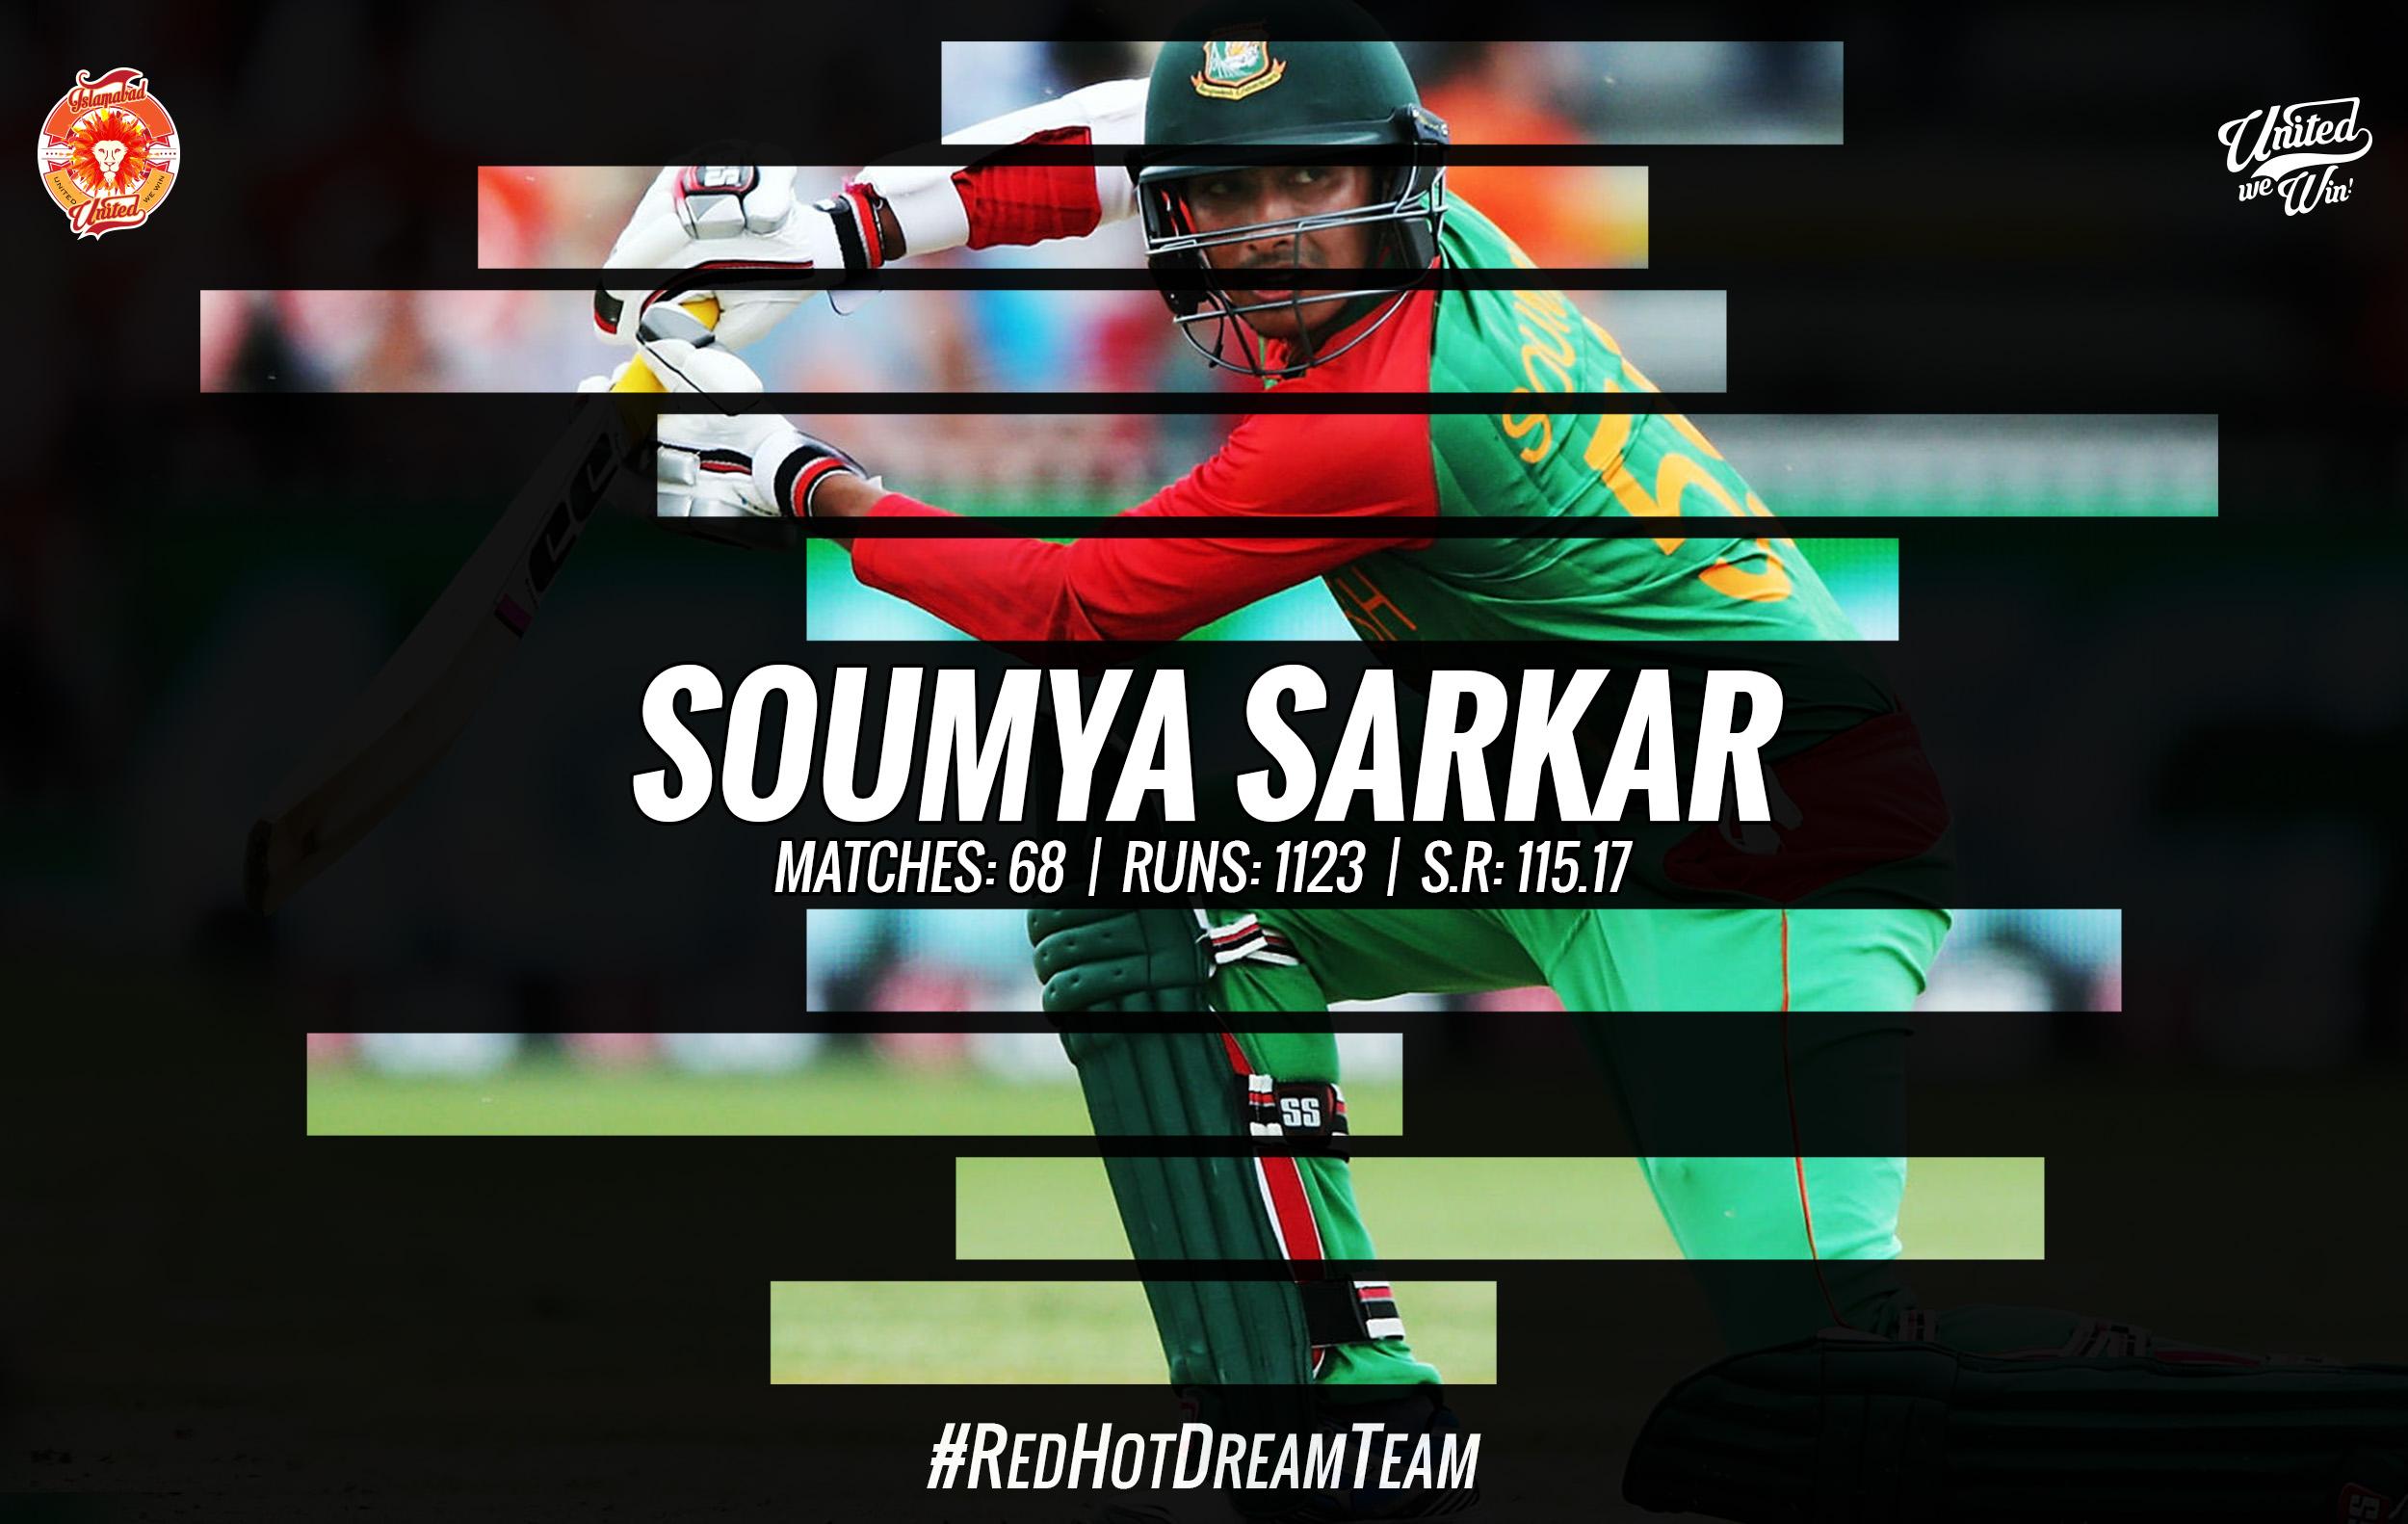 Soumya Sarkar